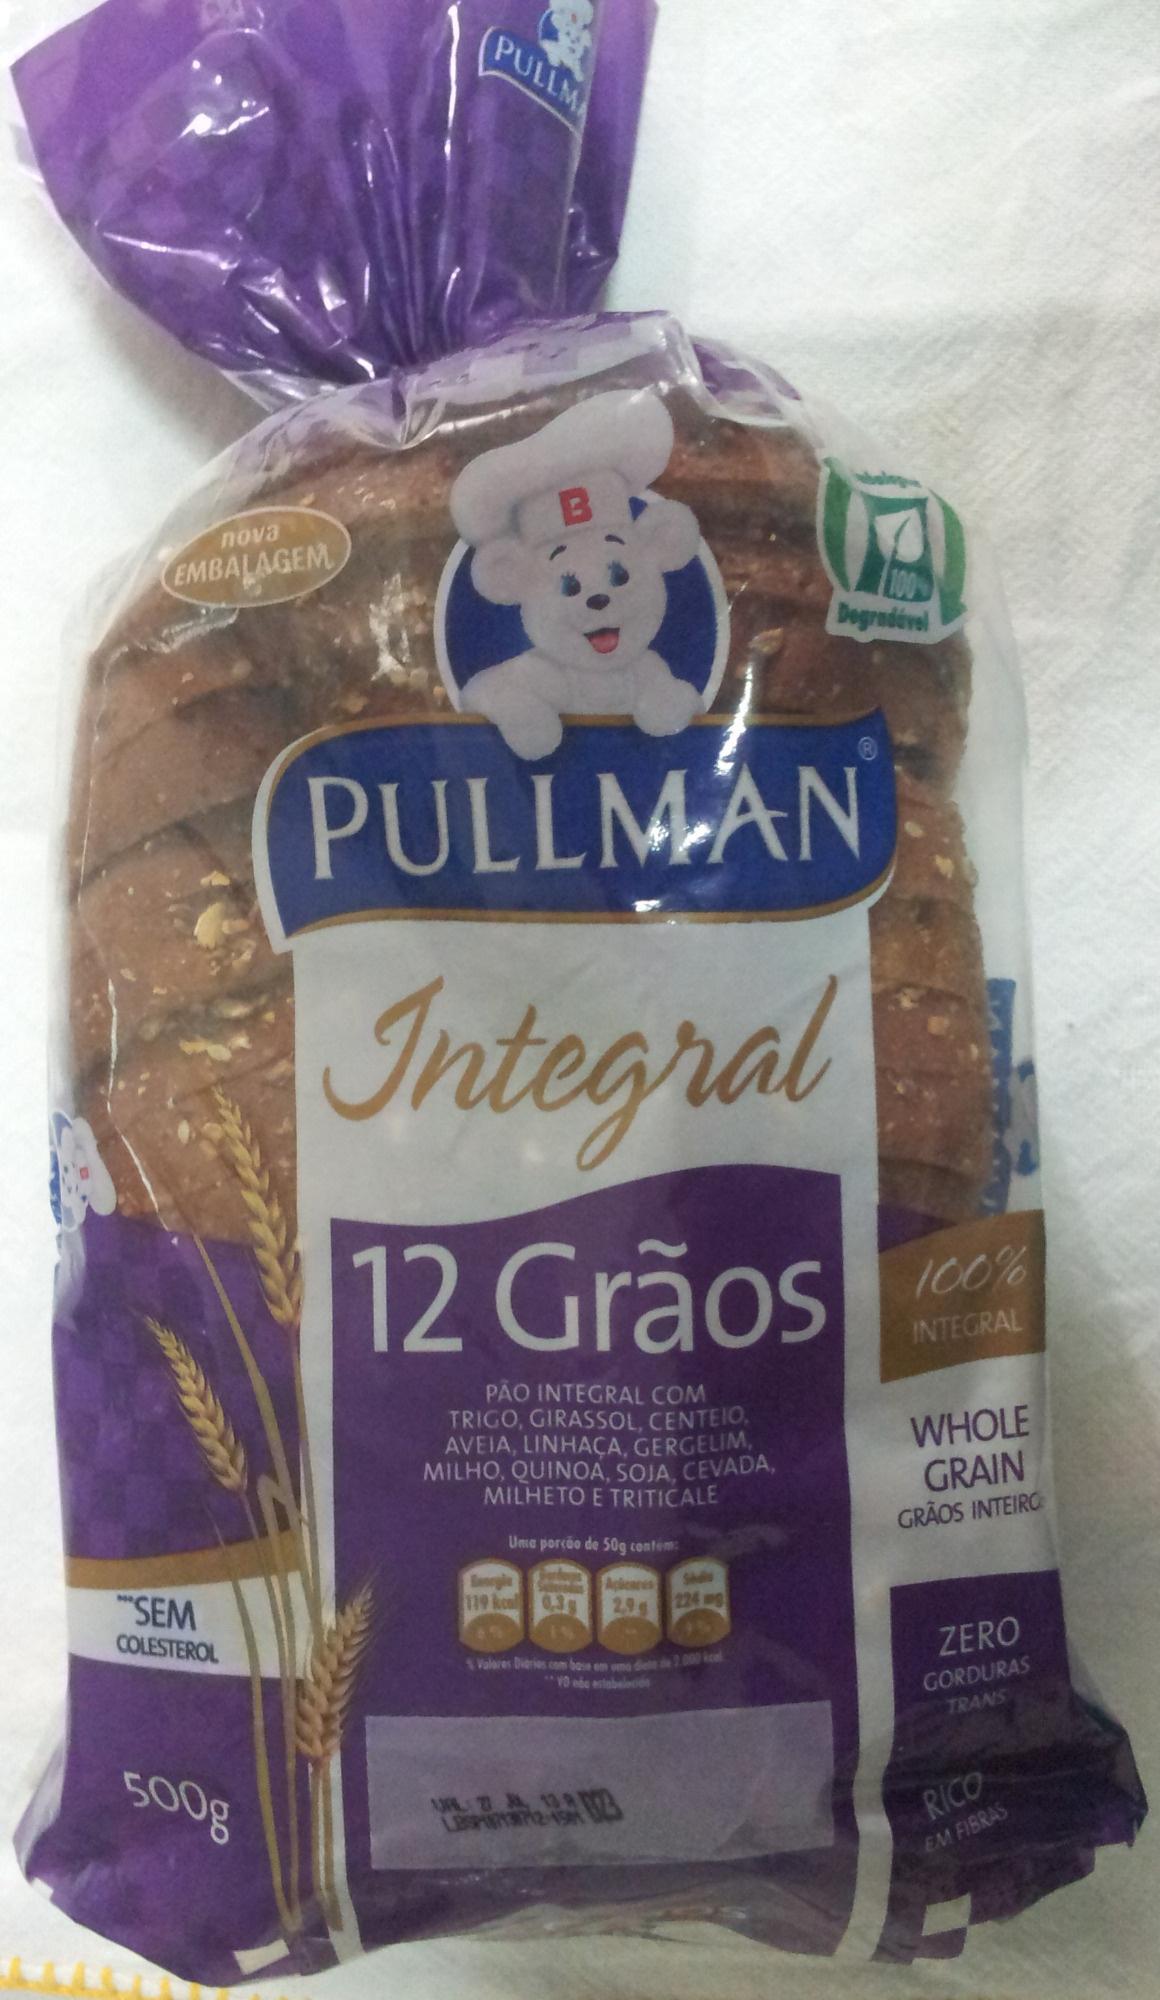 Pullman Integral 12 Grãos - Product